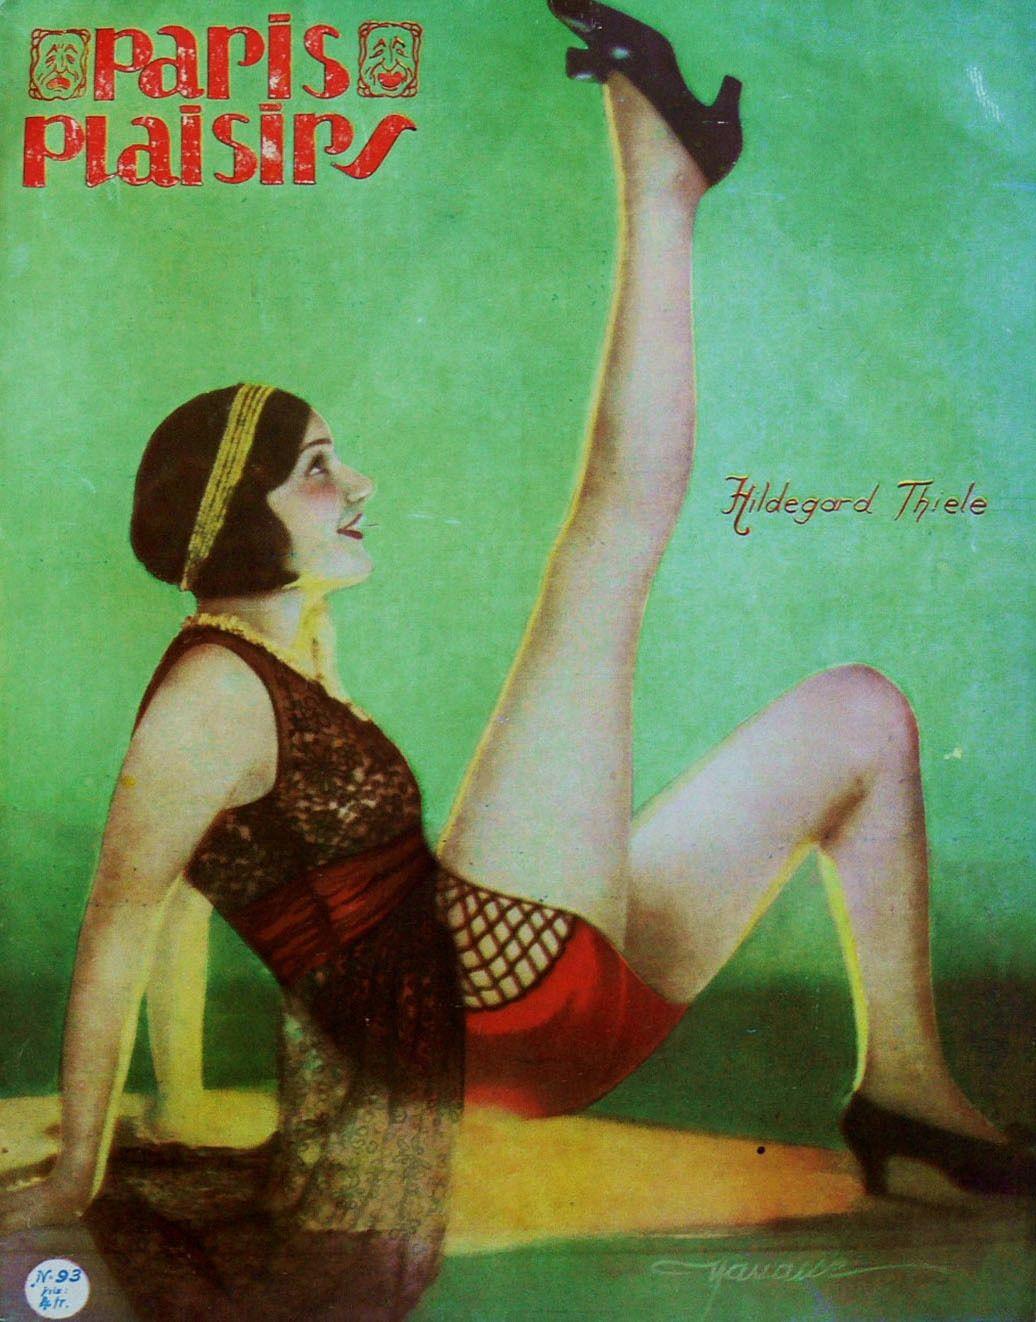 MARS 1930.........HILDEGARD THIELE......SOURCE WHATABOUTBOBBED.TUMBLR.COM.........